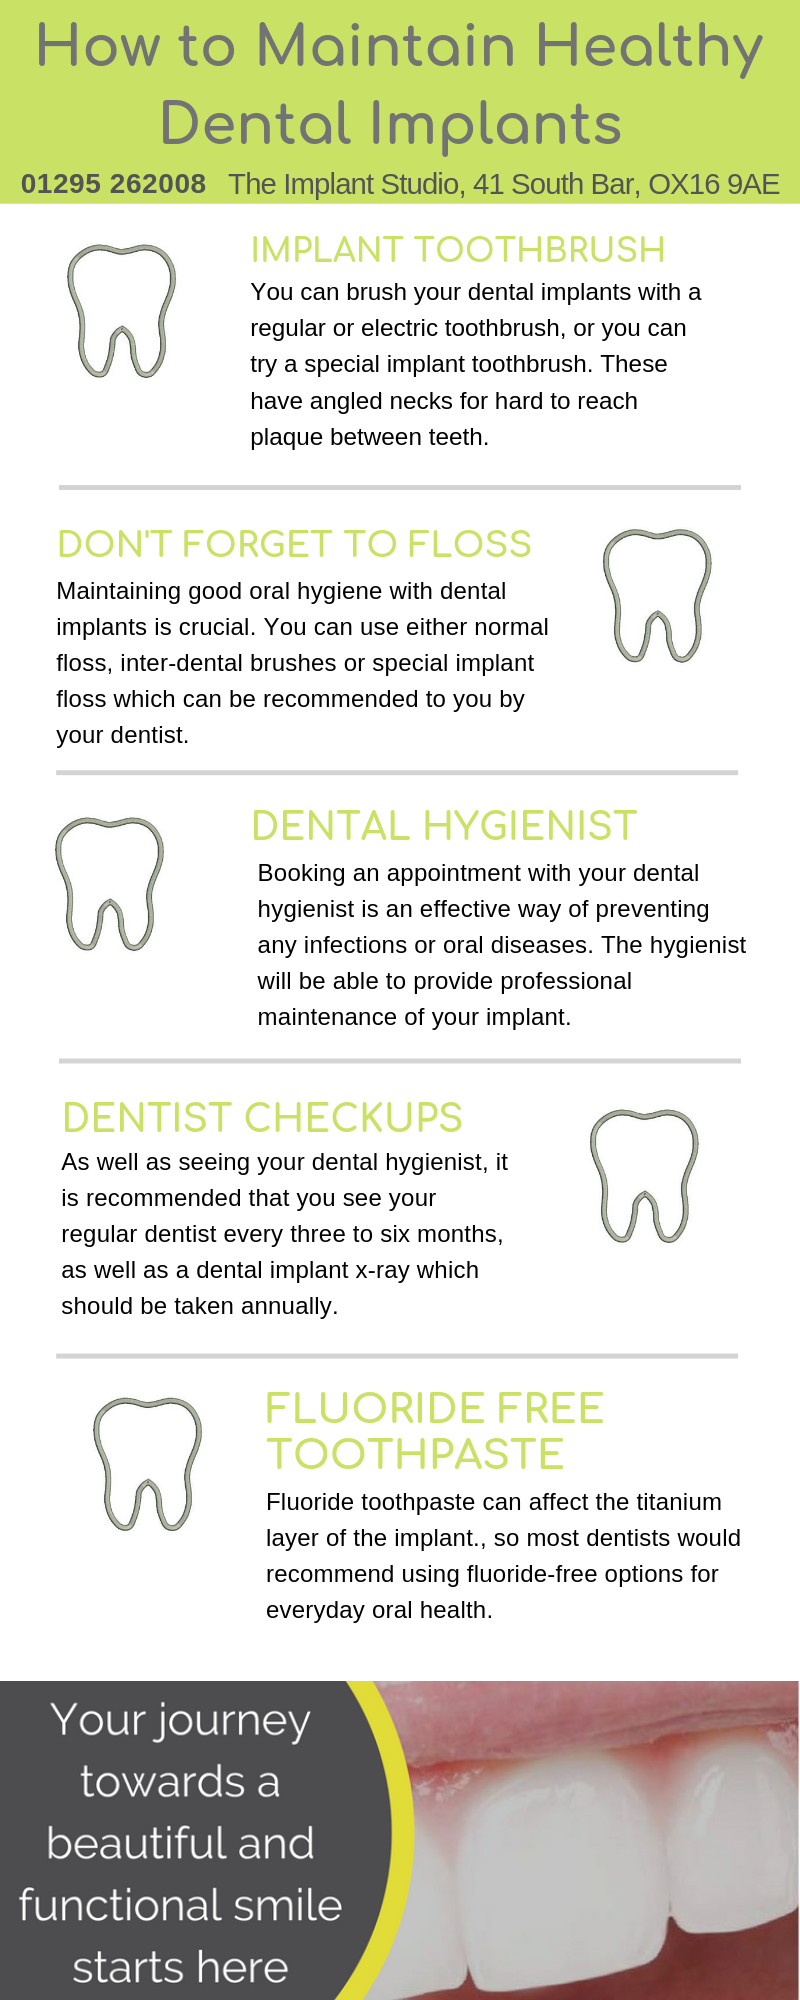 Dental implants infographic